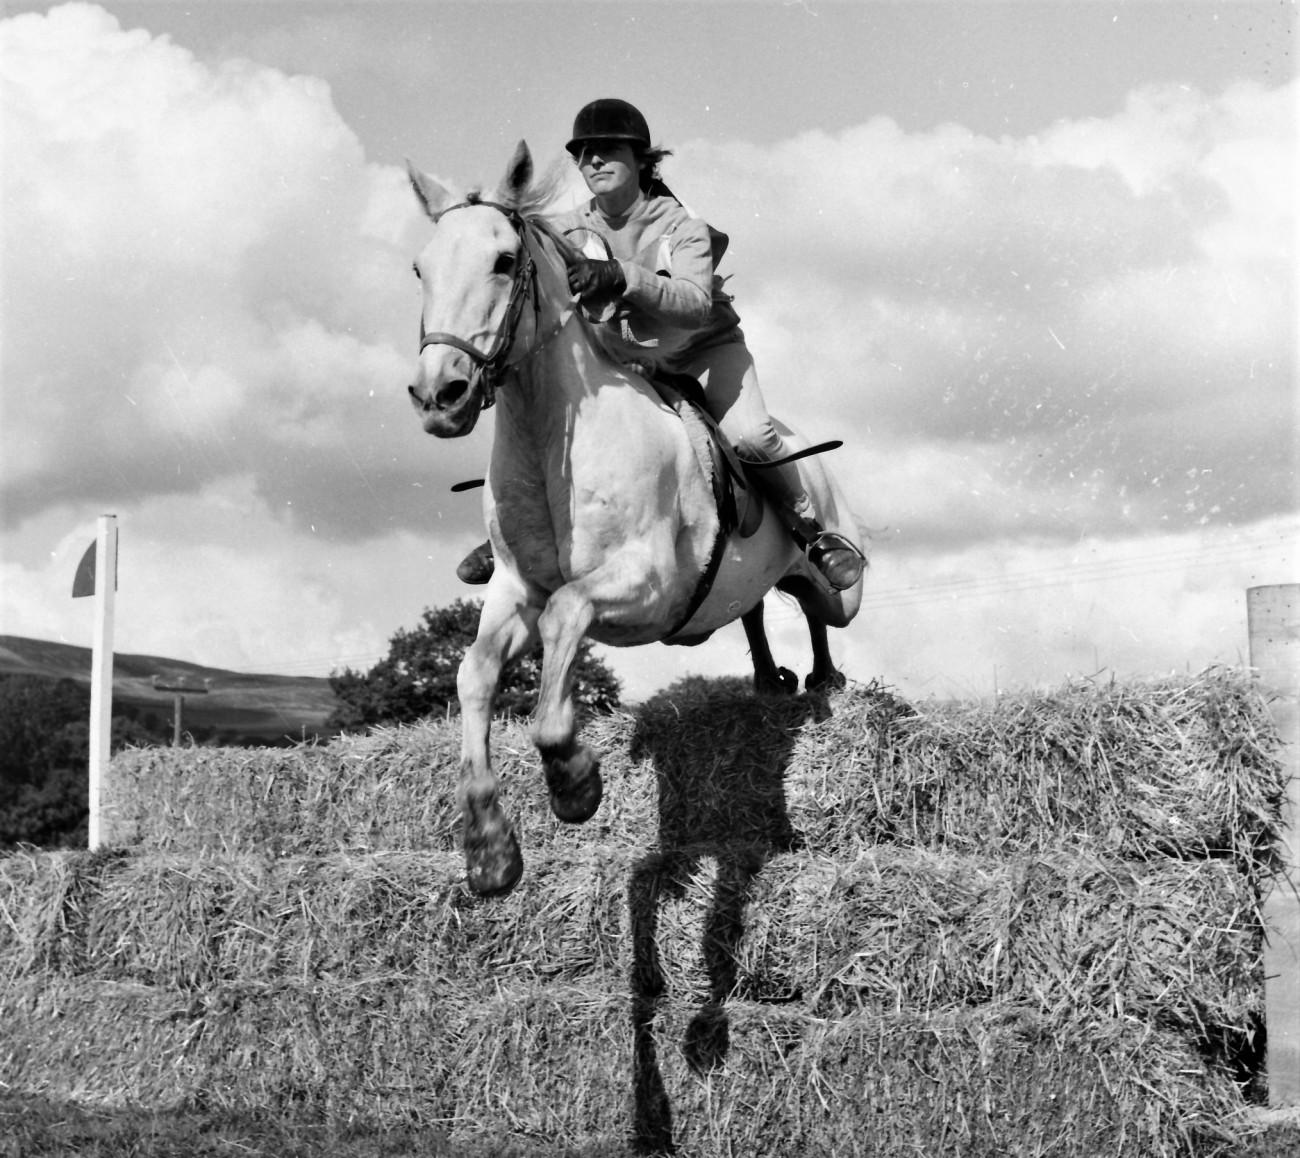 Horse Trials Draw Crowds